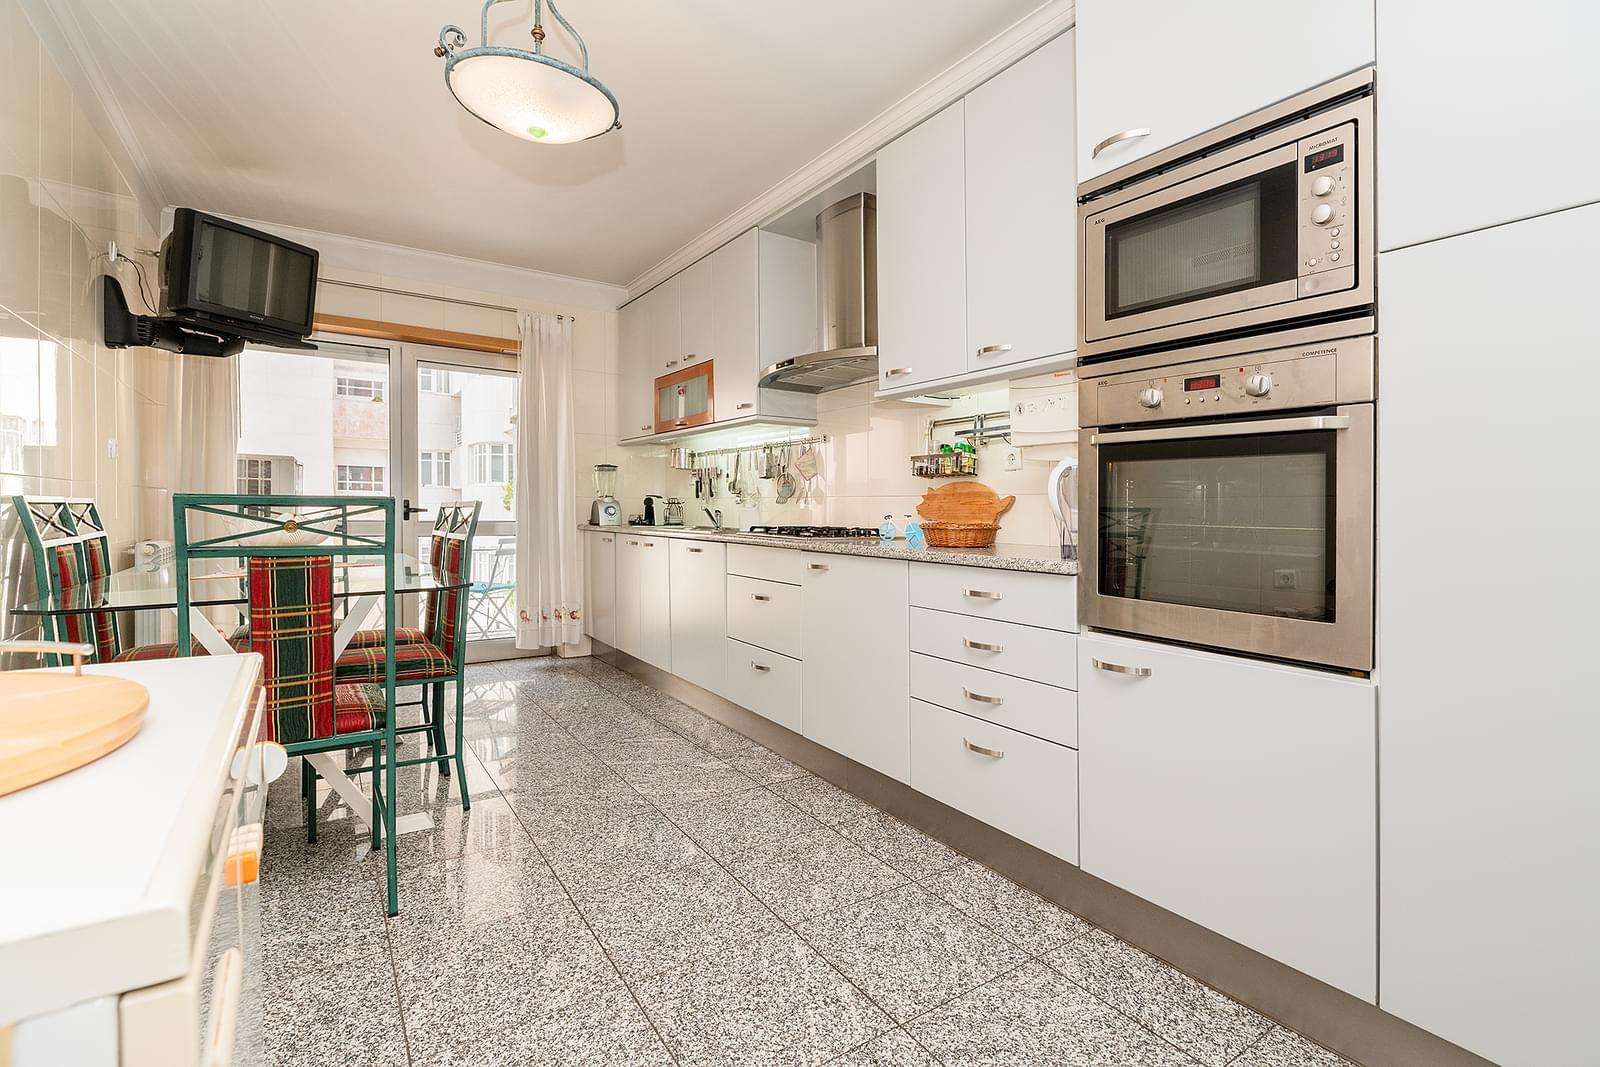 pf18049-apartamento-t3-lisboa-b67bdc66-1443-4f47-a1ed-84b5c21e210f